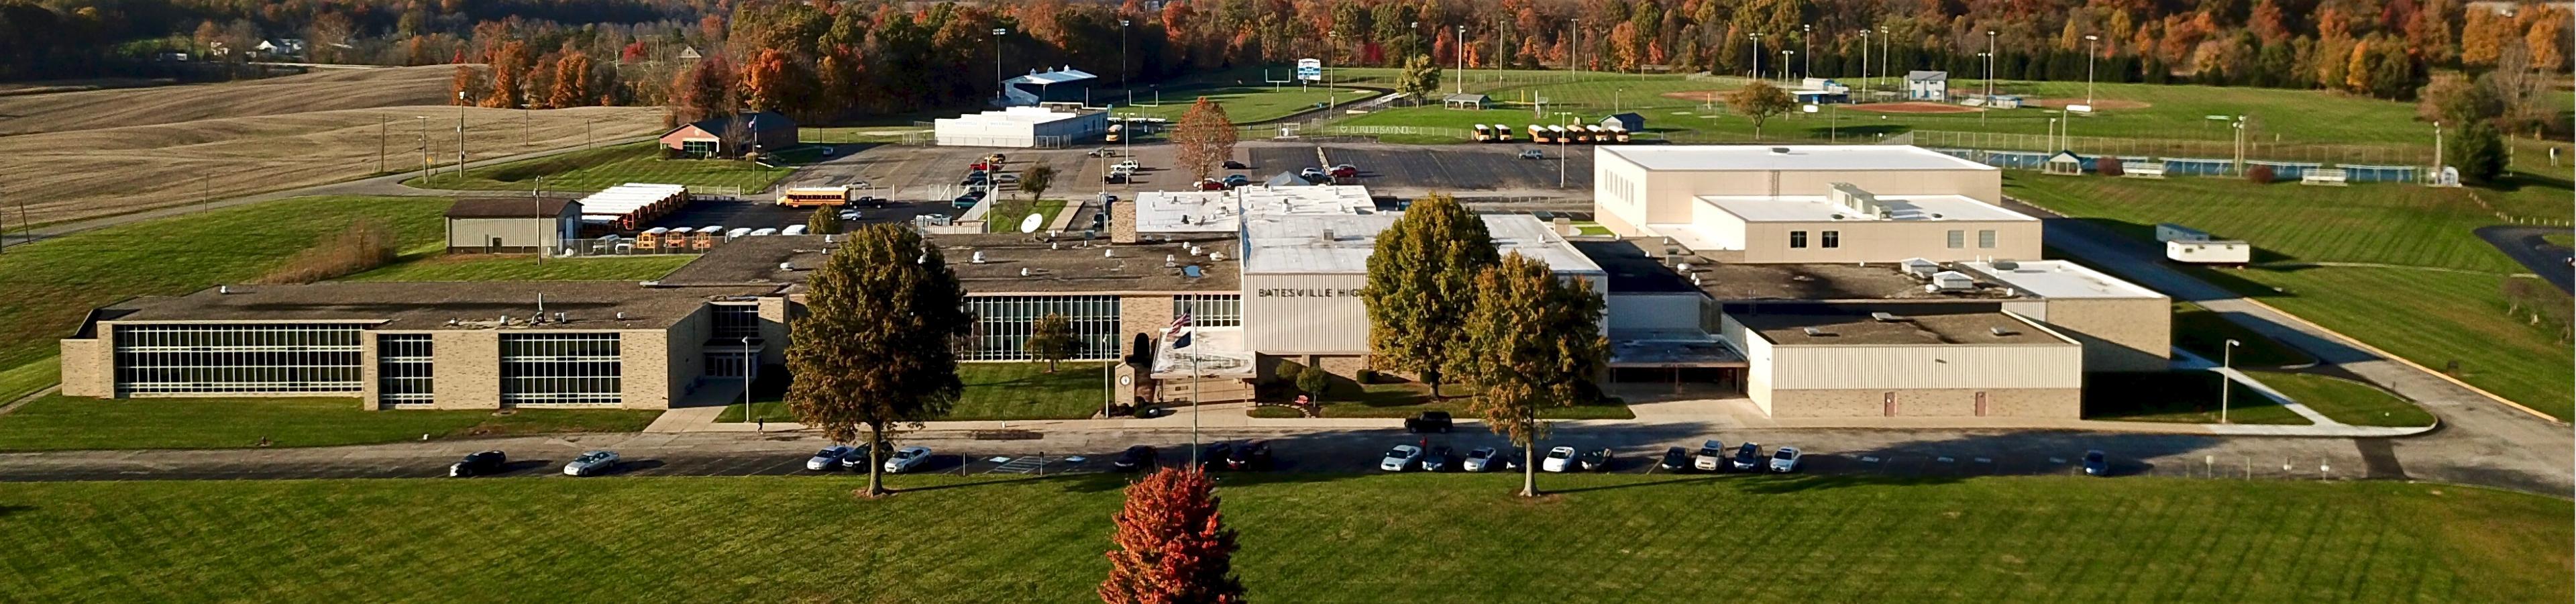 Batesville Community Education Foundation addresses workforce development, helps high school students build social capital